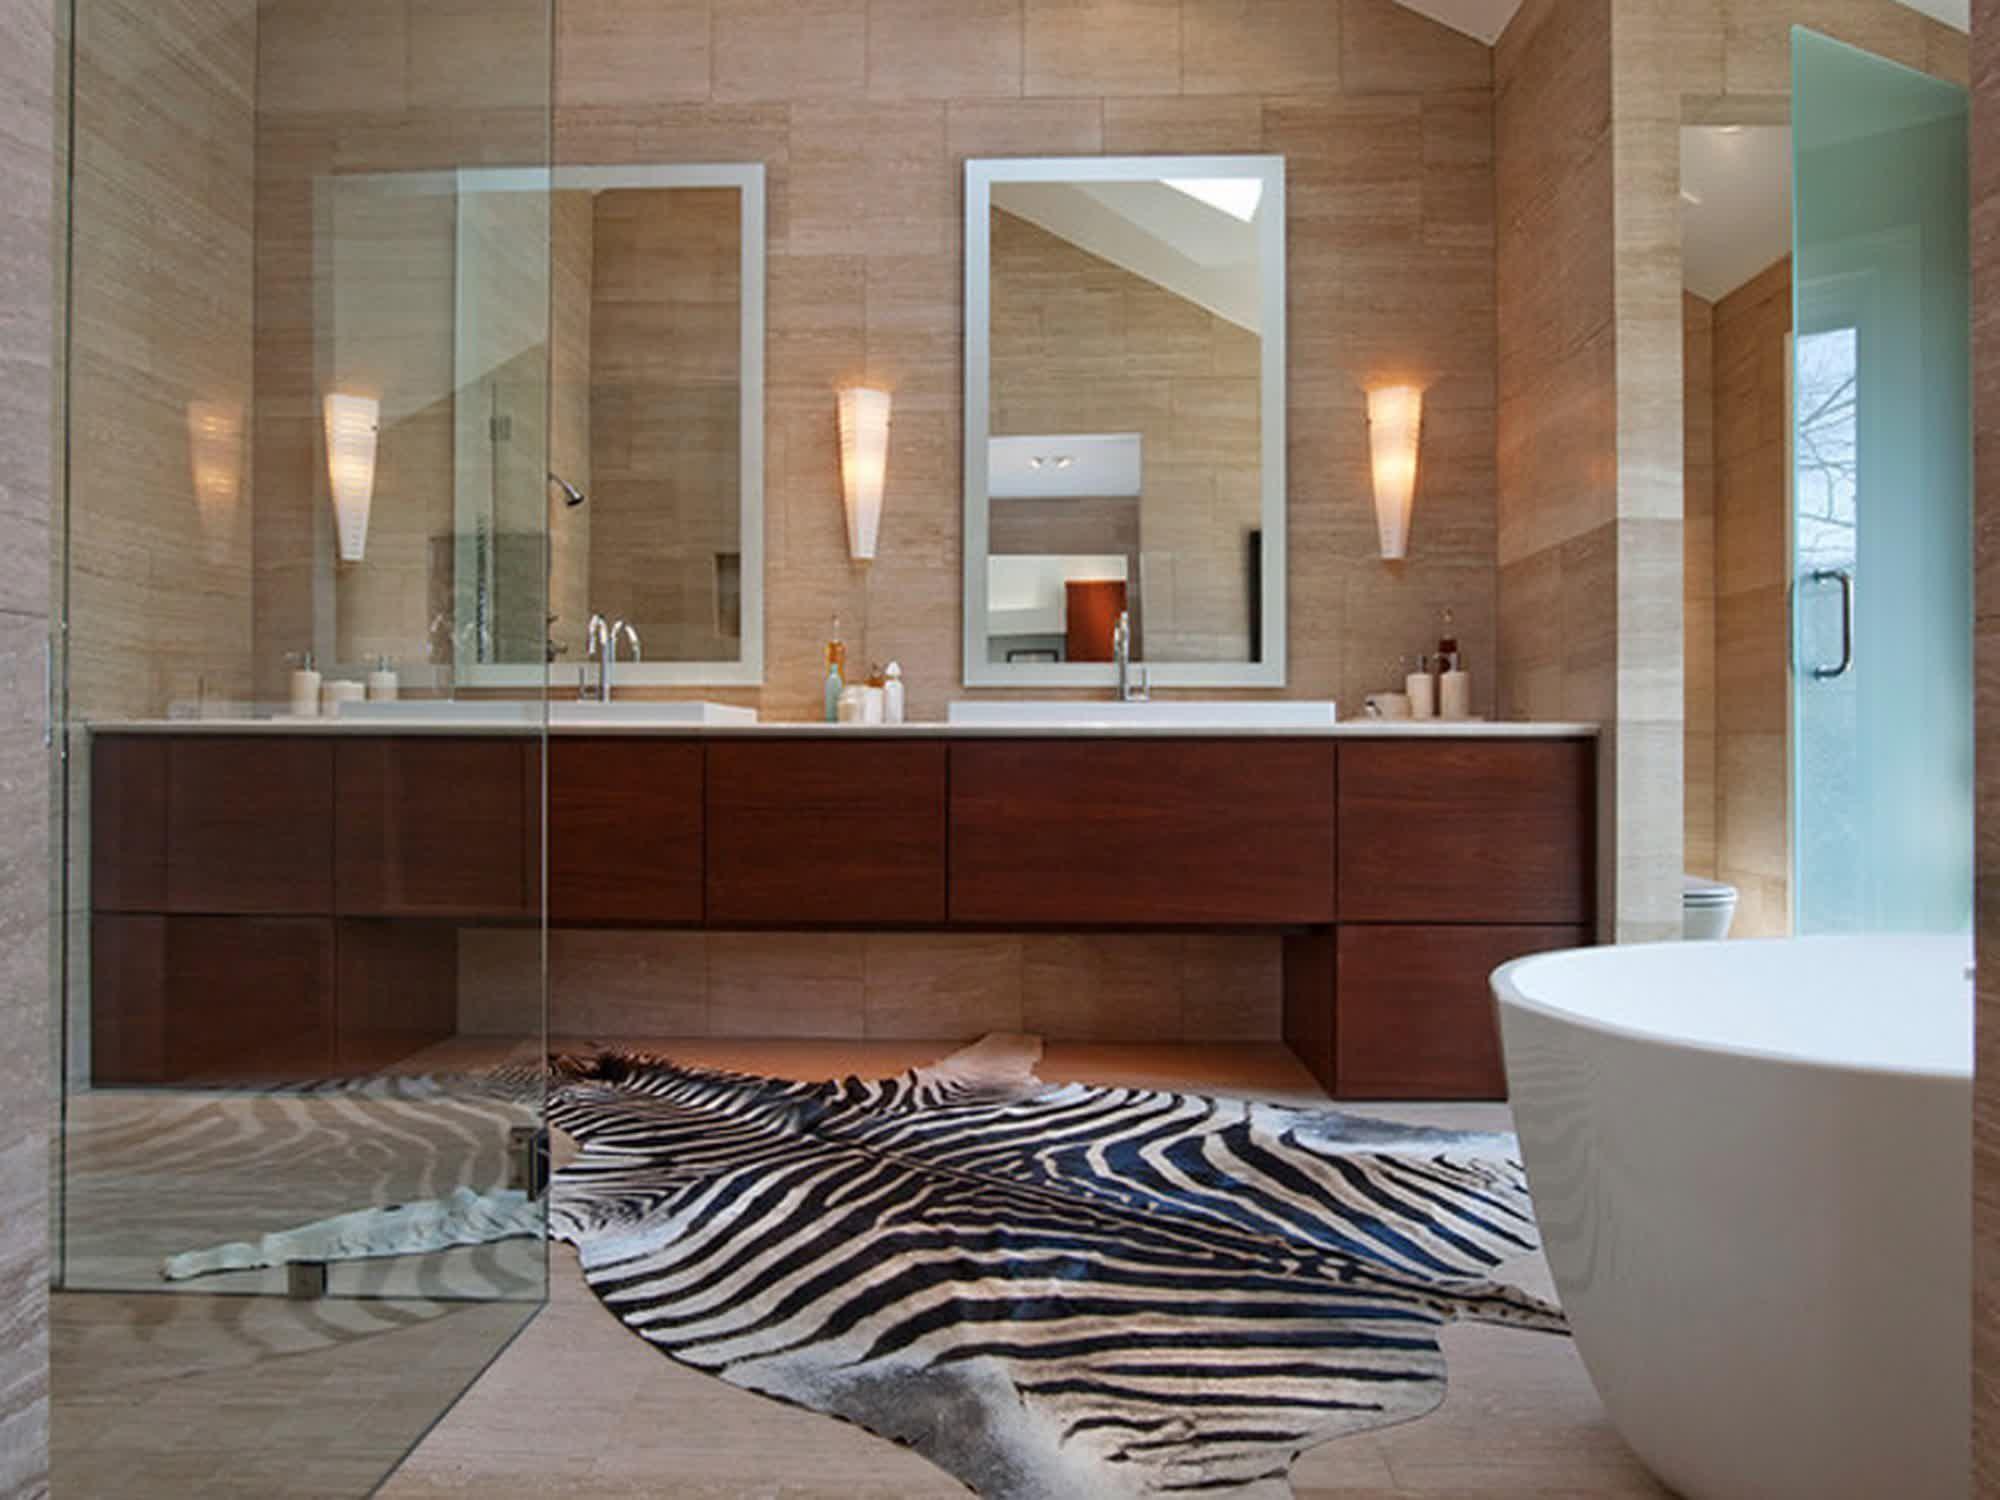 Large Bathroom Design Effigy Of Large Bathroom Rugs  Bathroom Design Inspiration